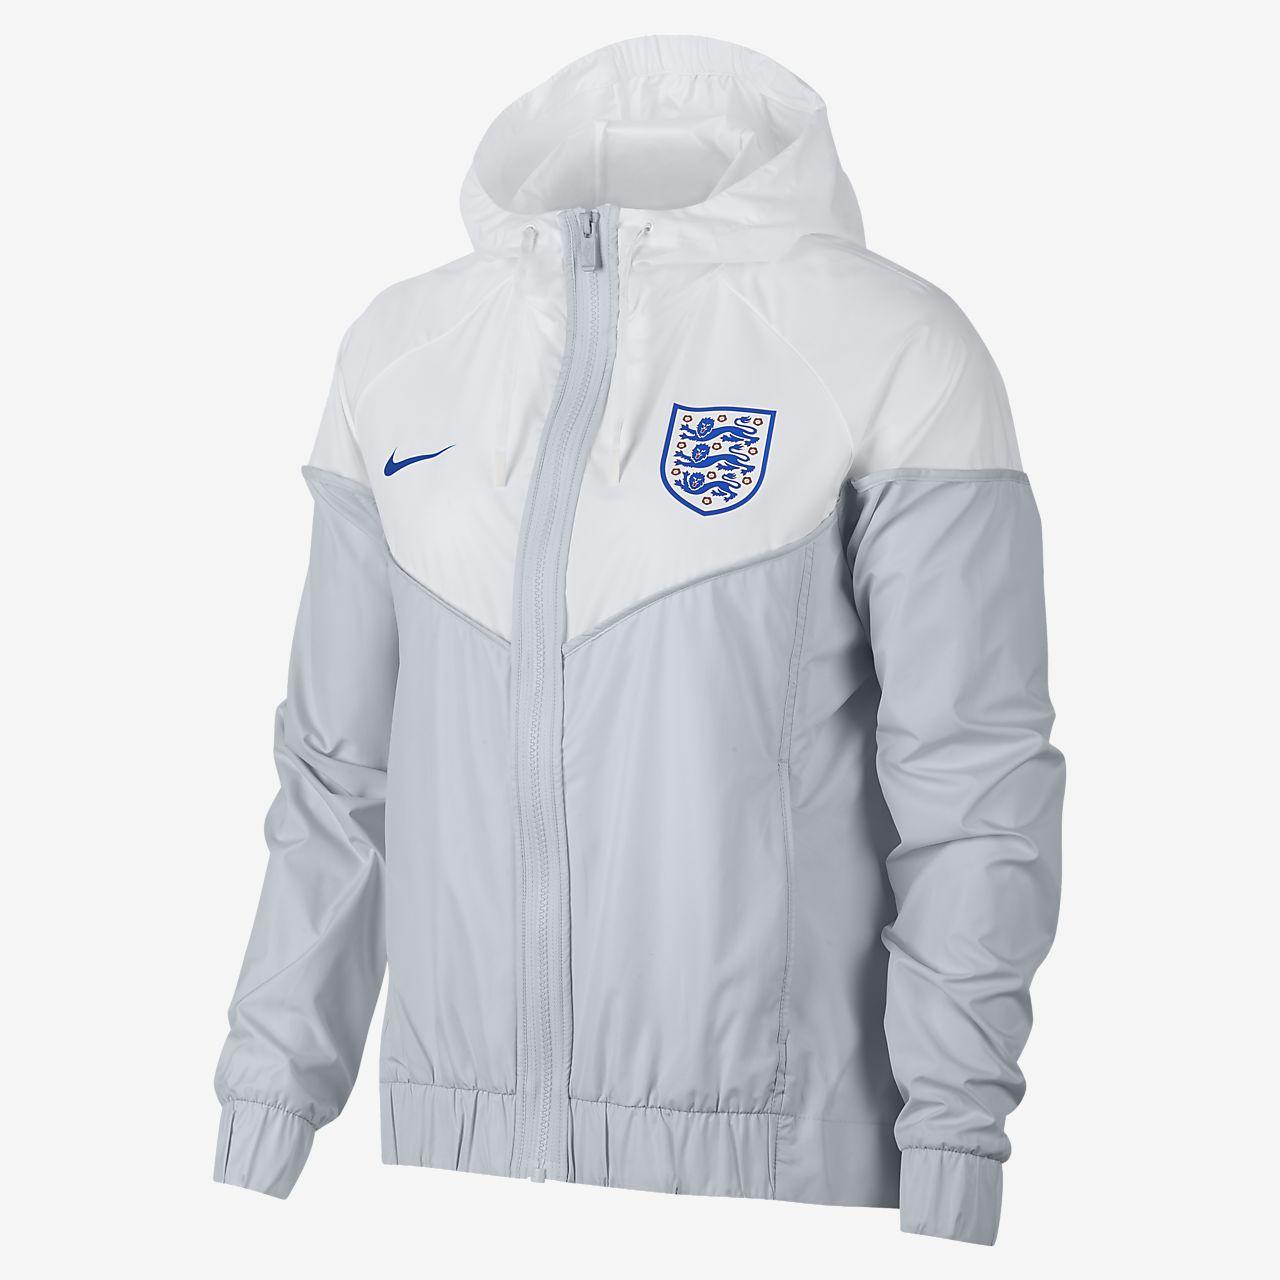 059b4d7cc3 England Windrunner Women s Jacket. Nike.com AU